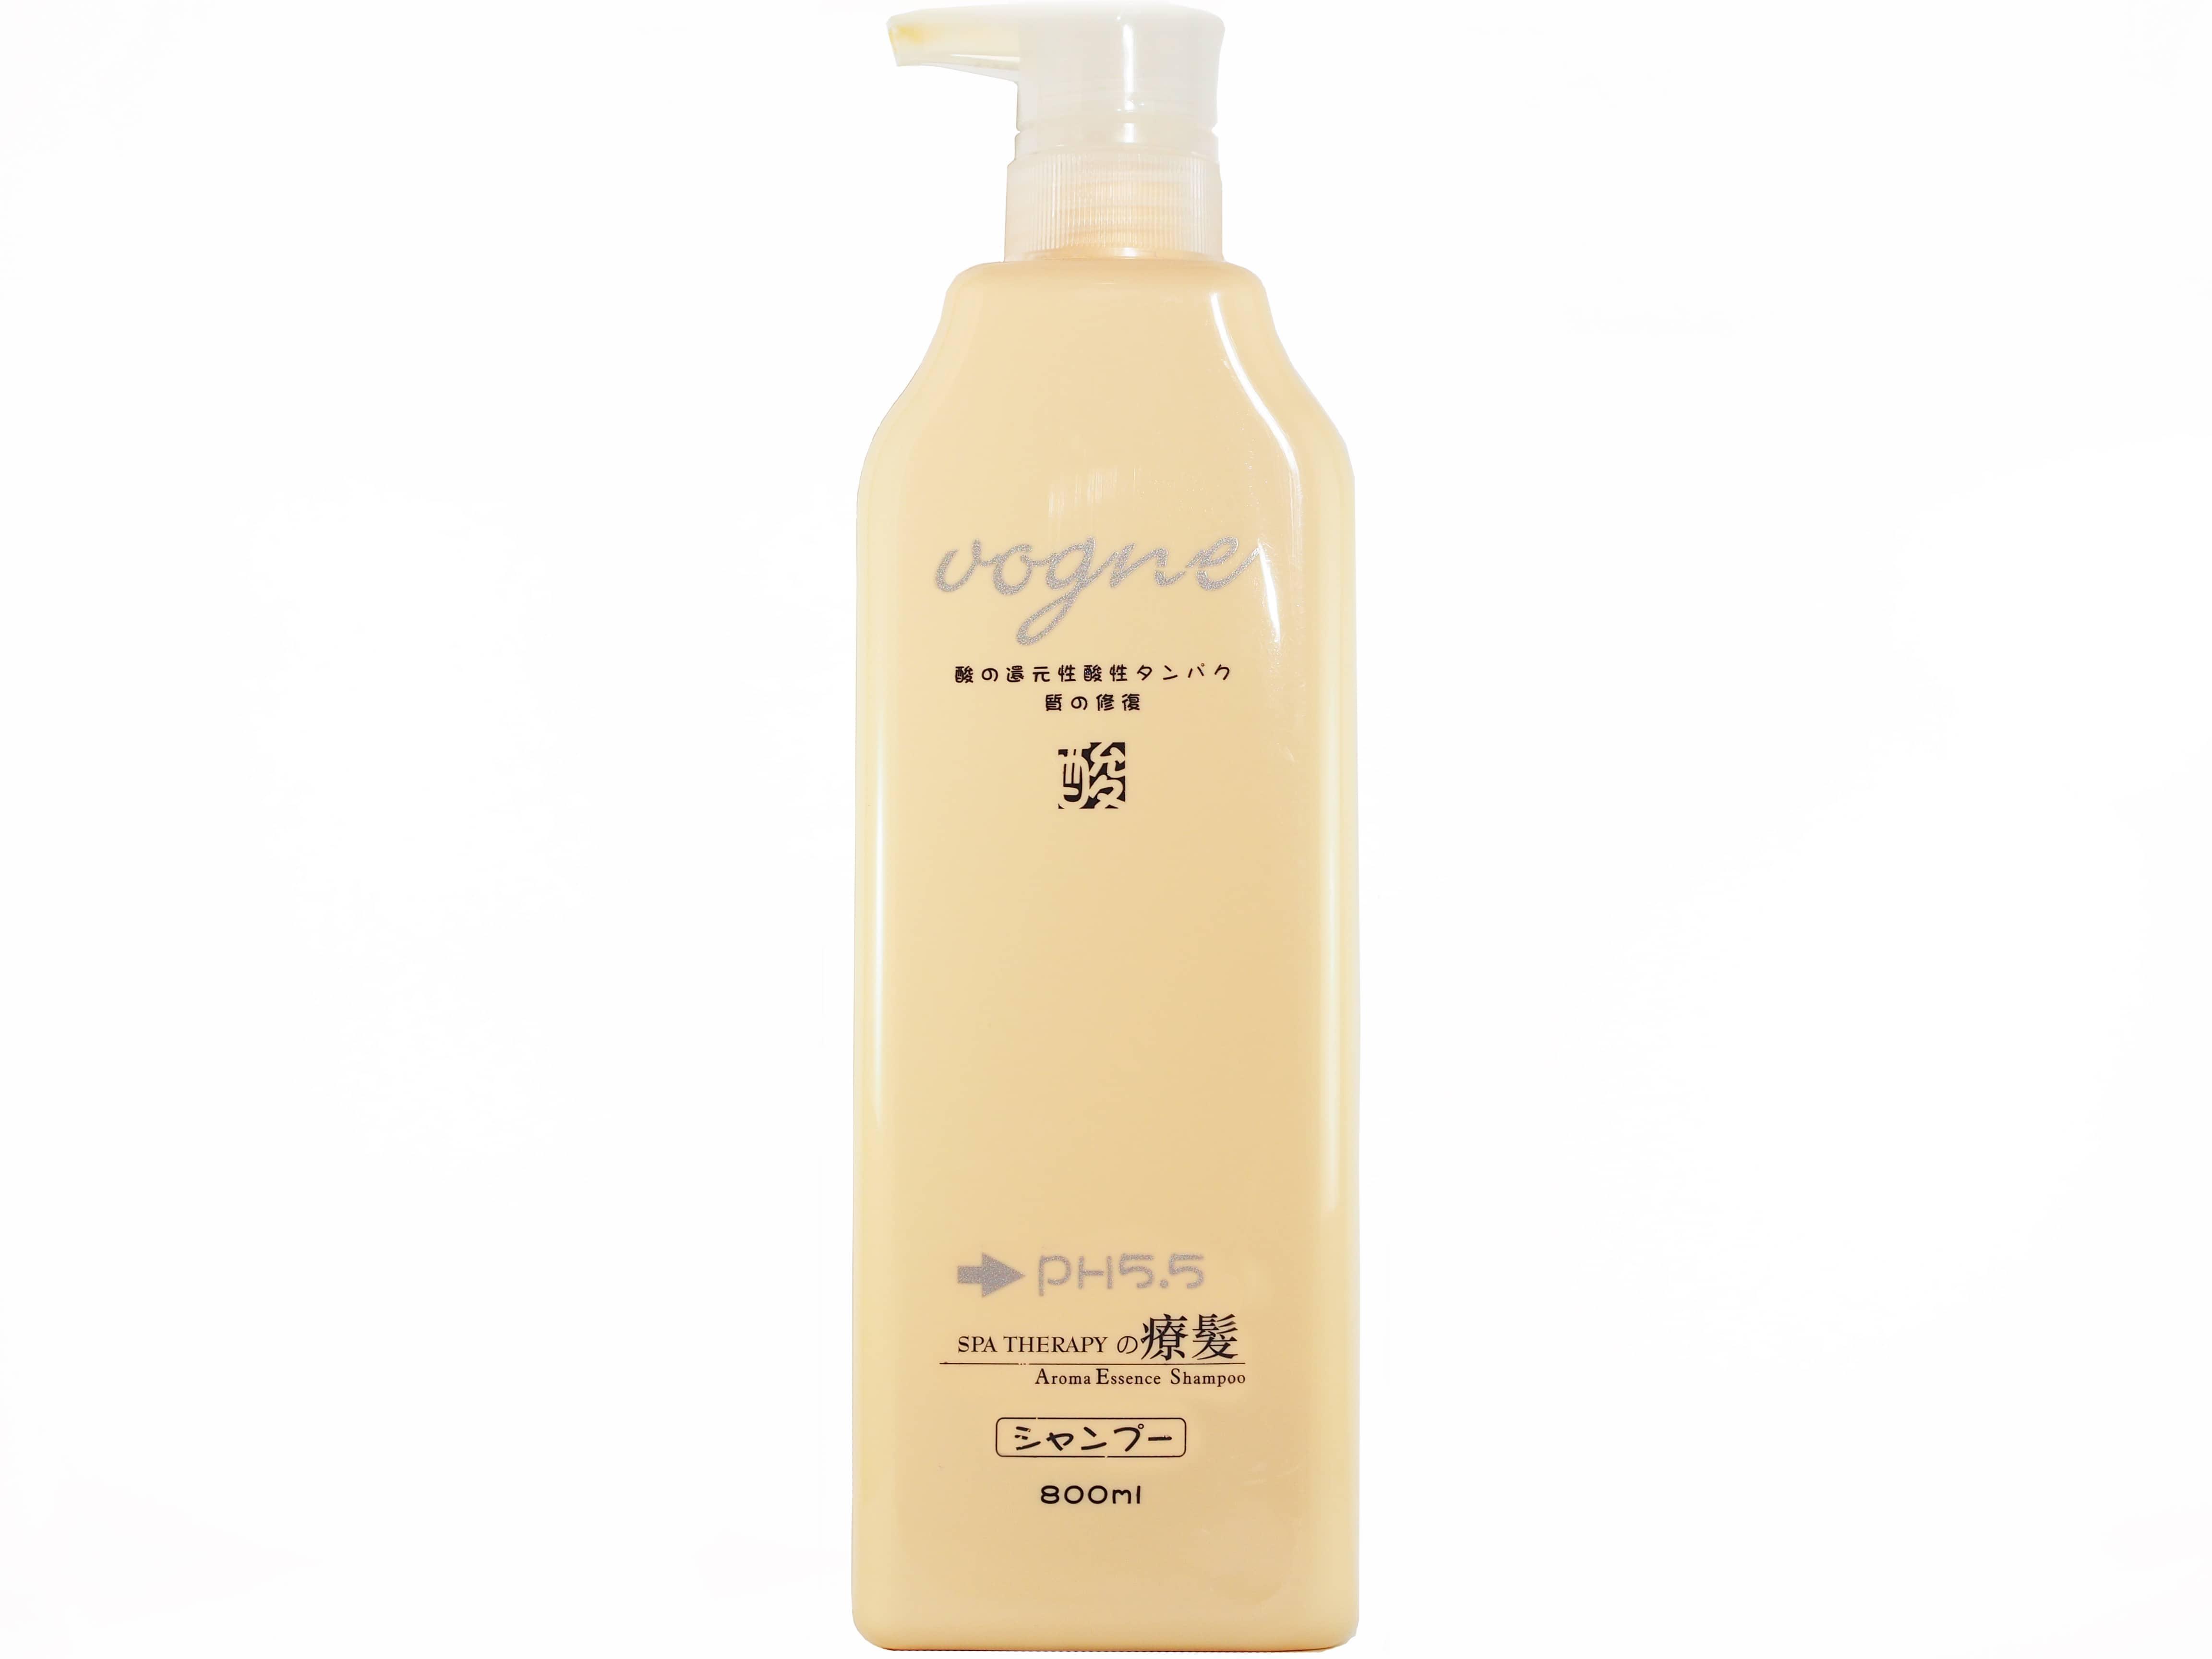 Vogne-Shampoo.jpg